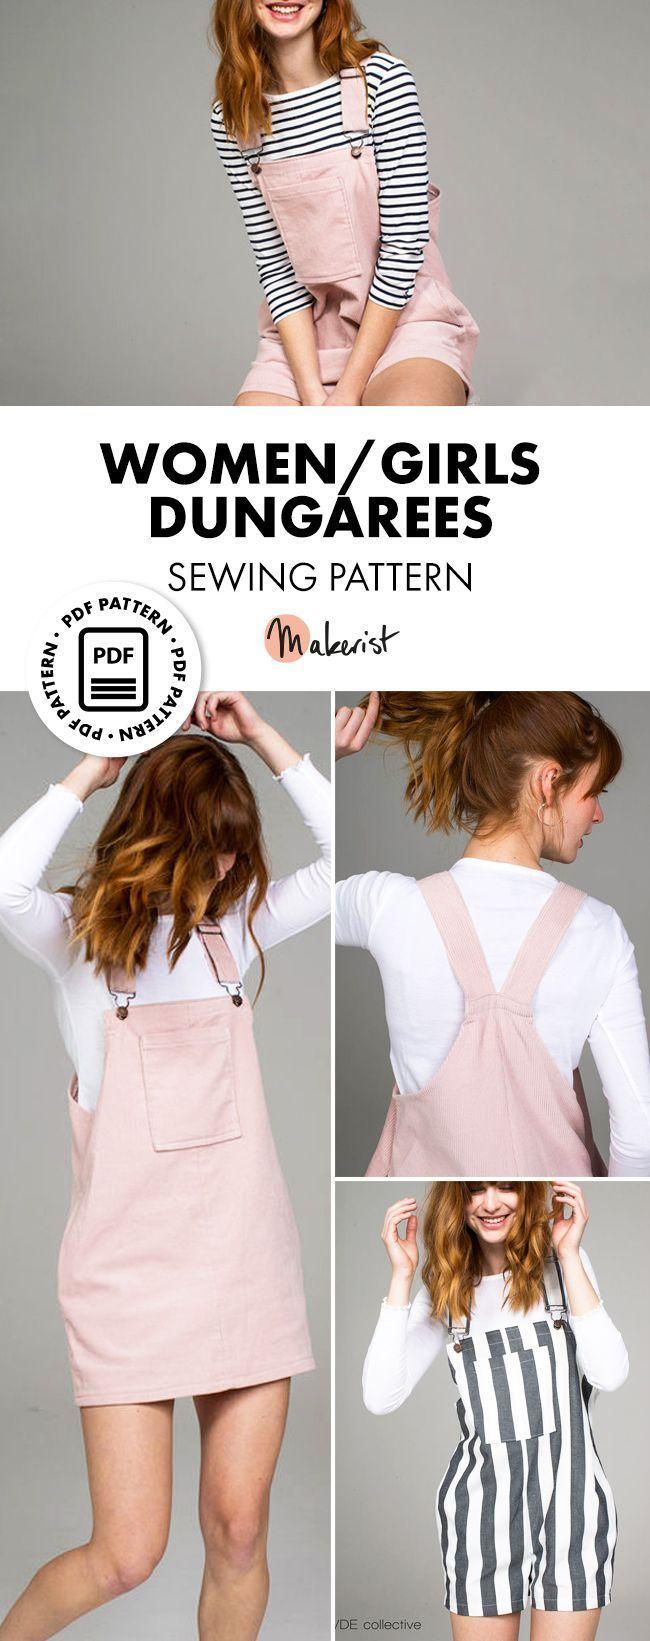 Damen Latzhose & Trägerkleid Schnittmuster Easy Latzhose PDF Sewing Patte ...